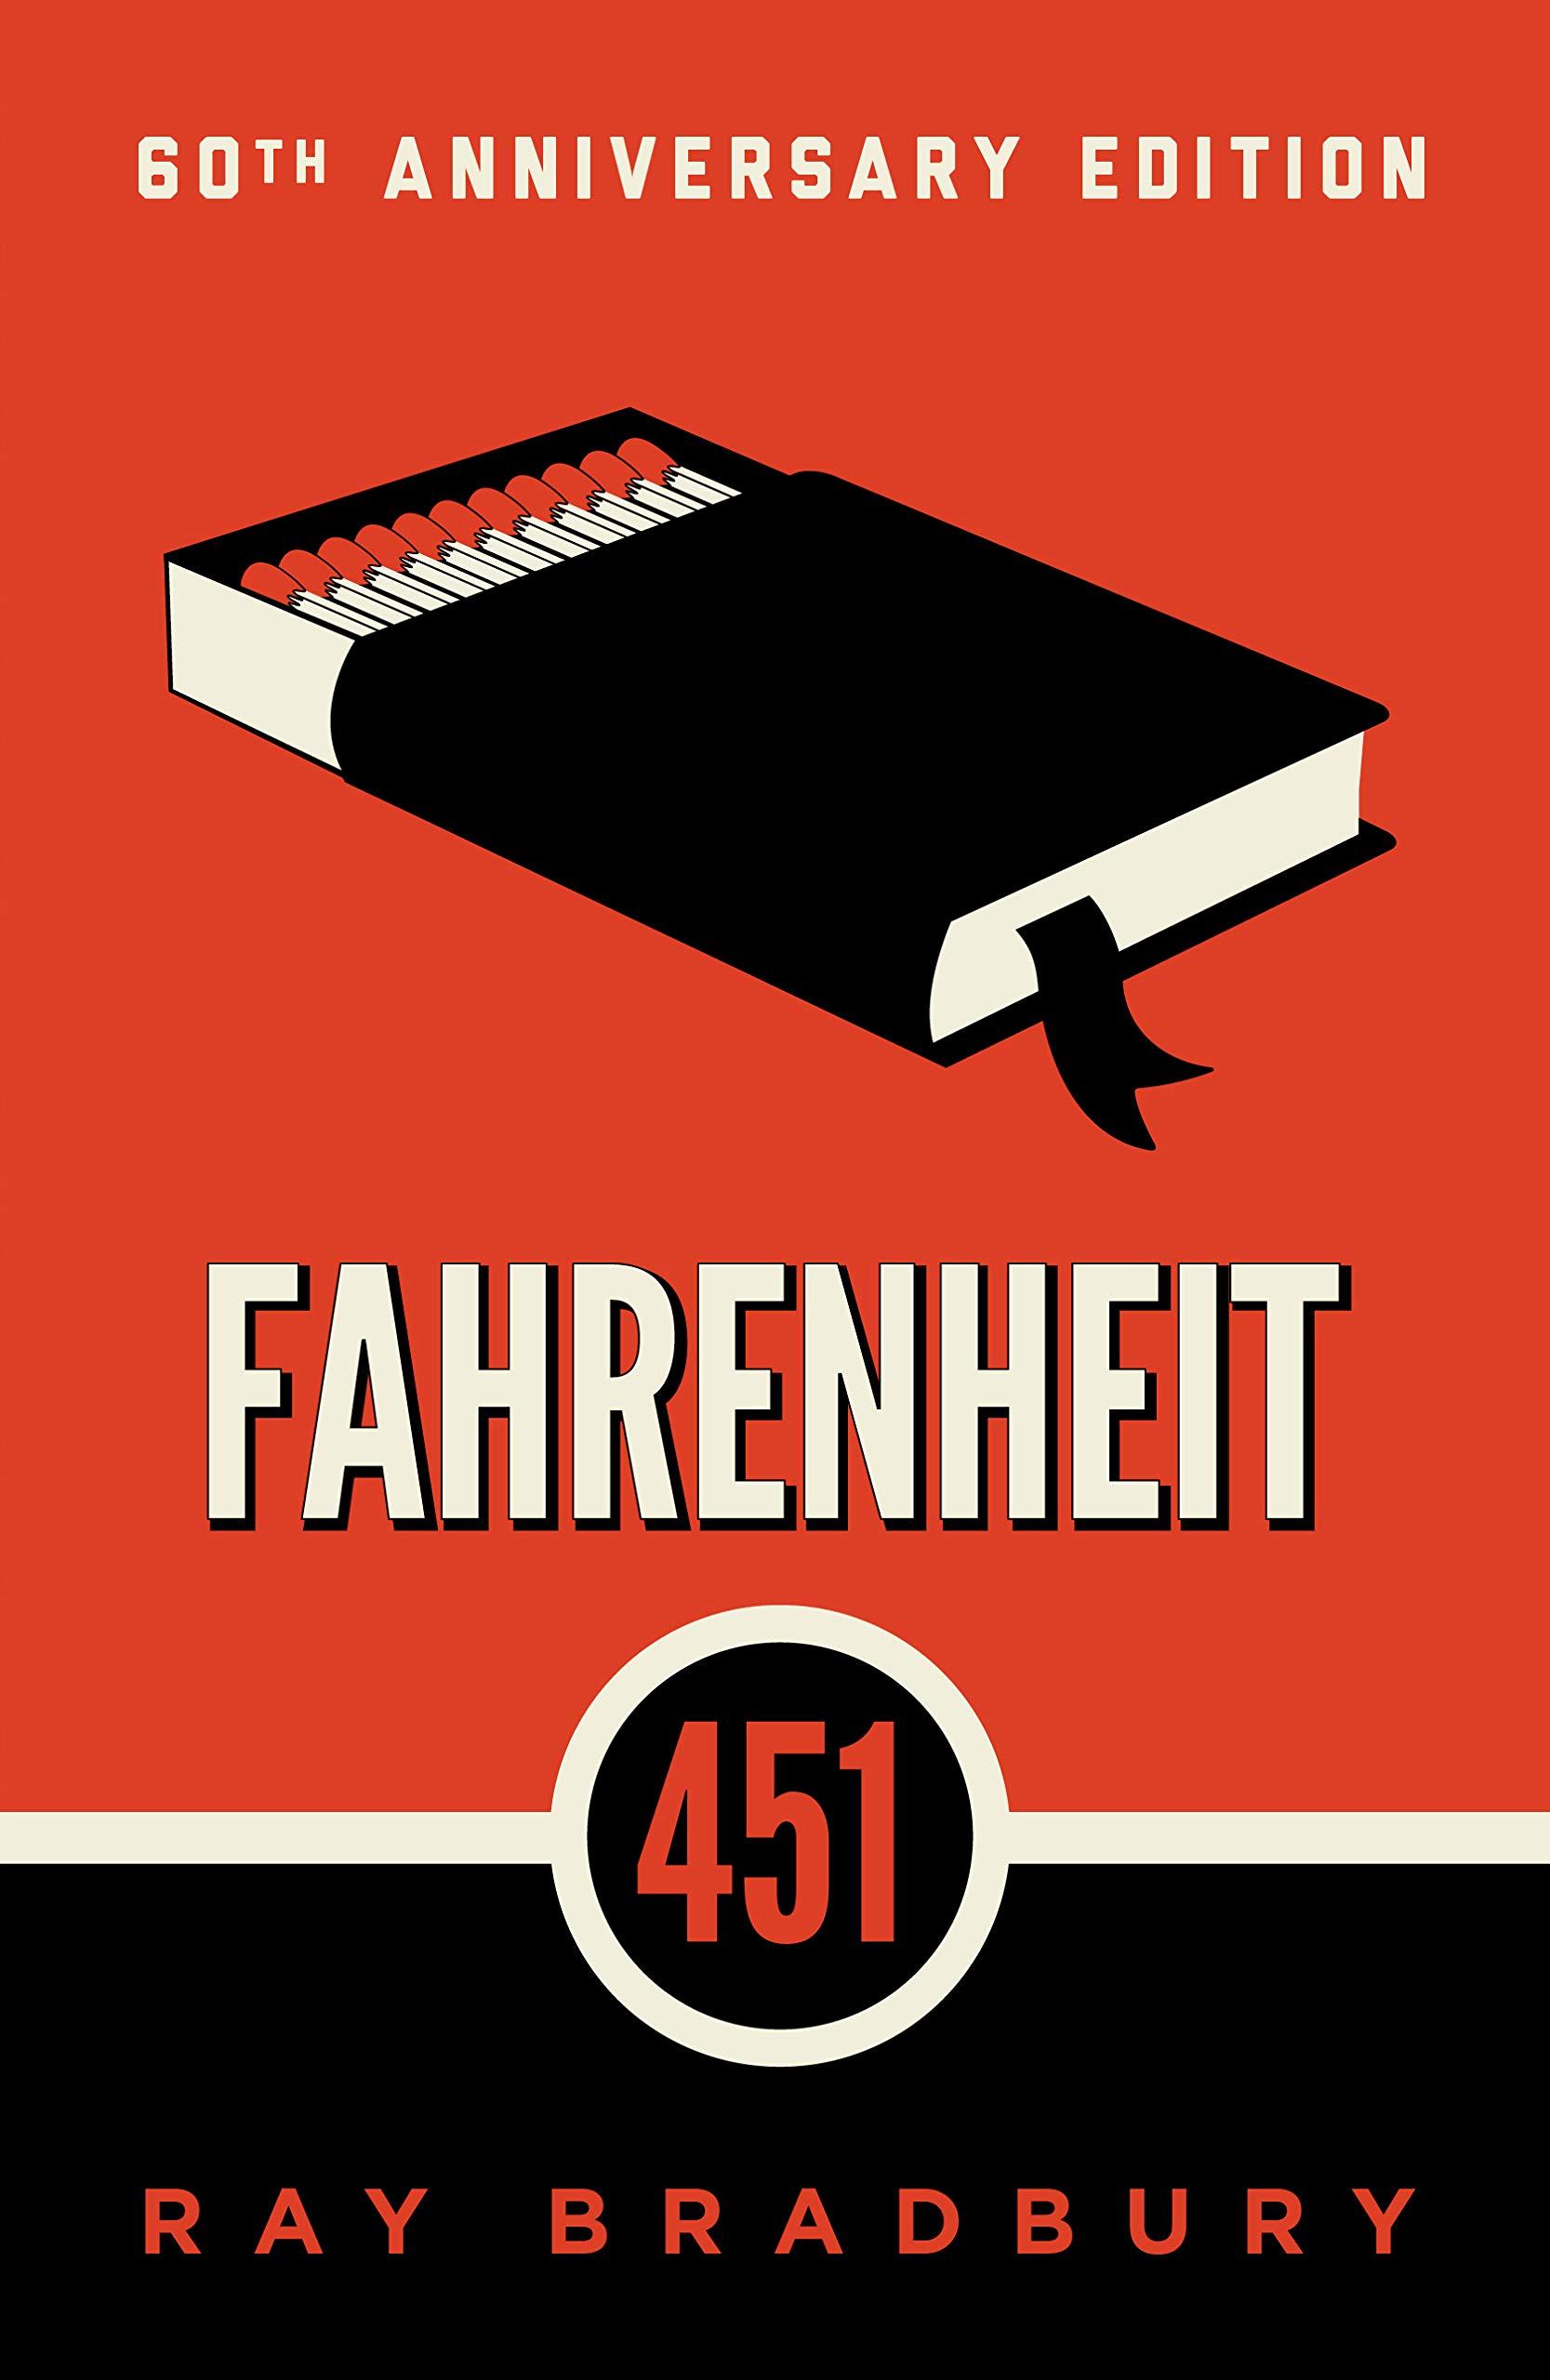 Ray Bradbury's Farenheit 451